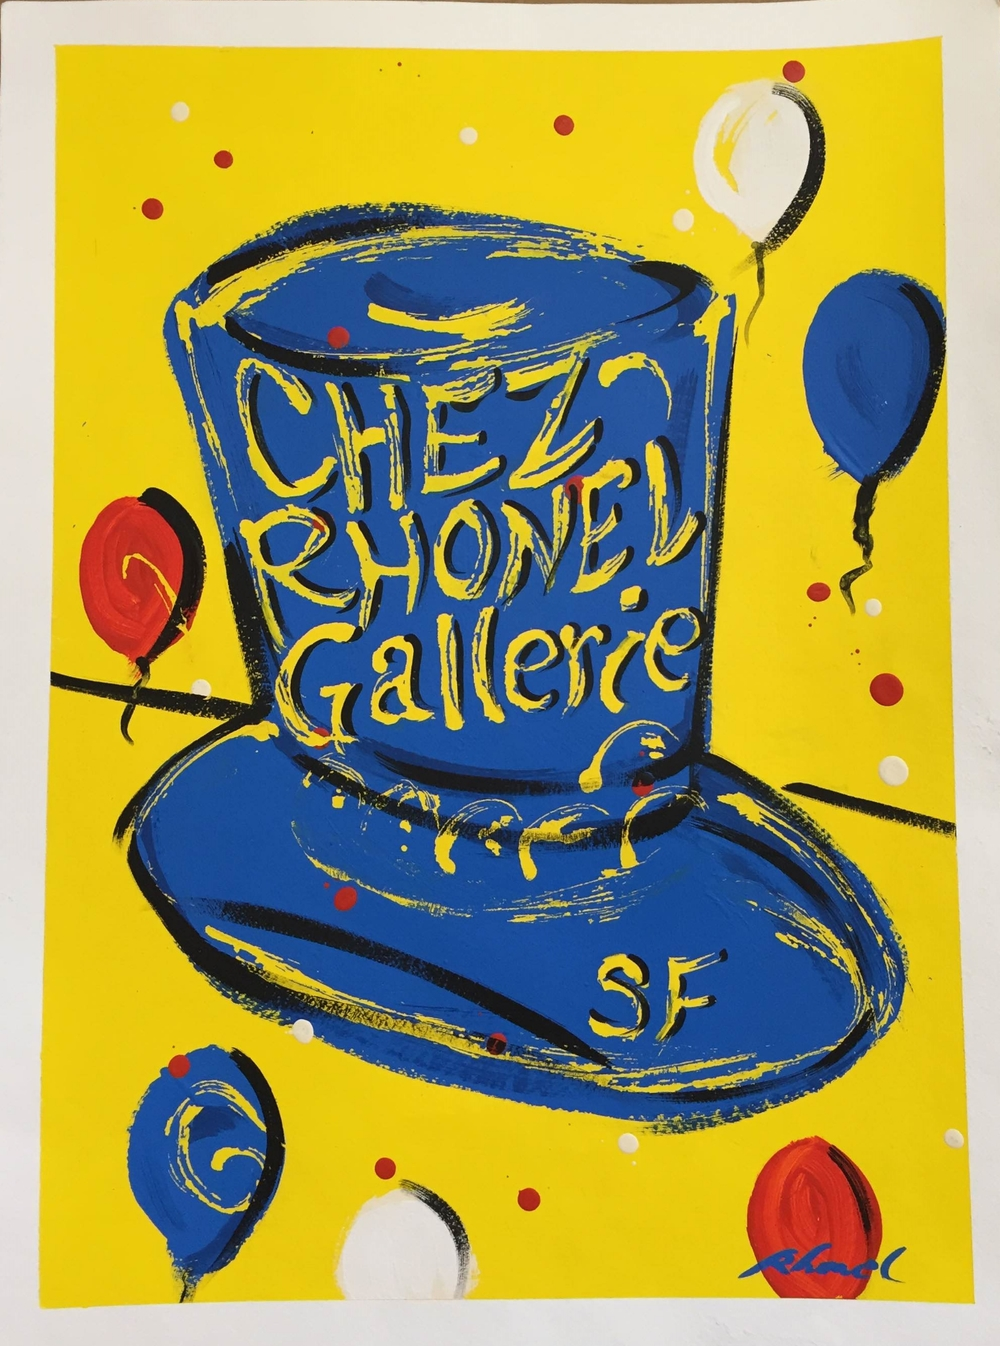 Chez Rhonel Poster (original)